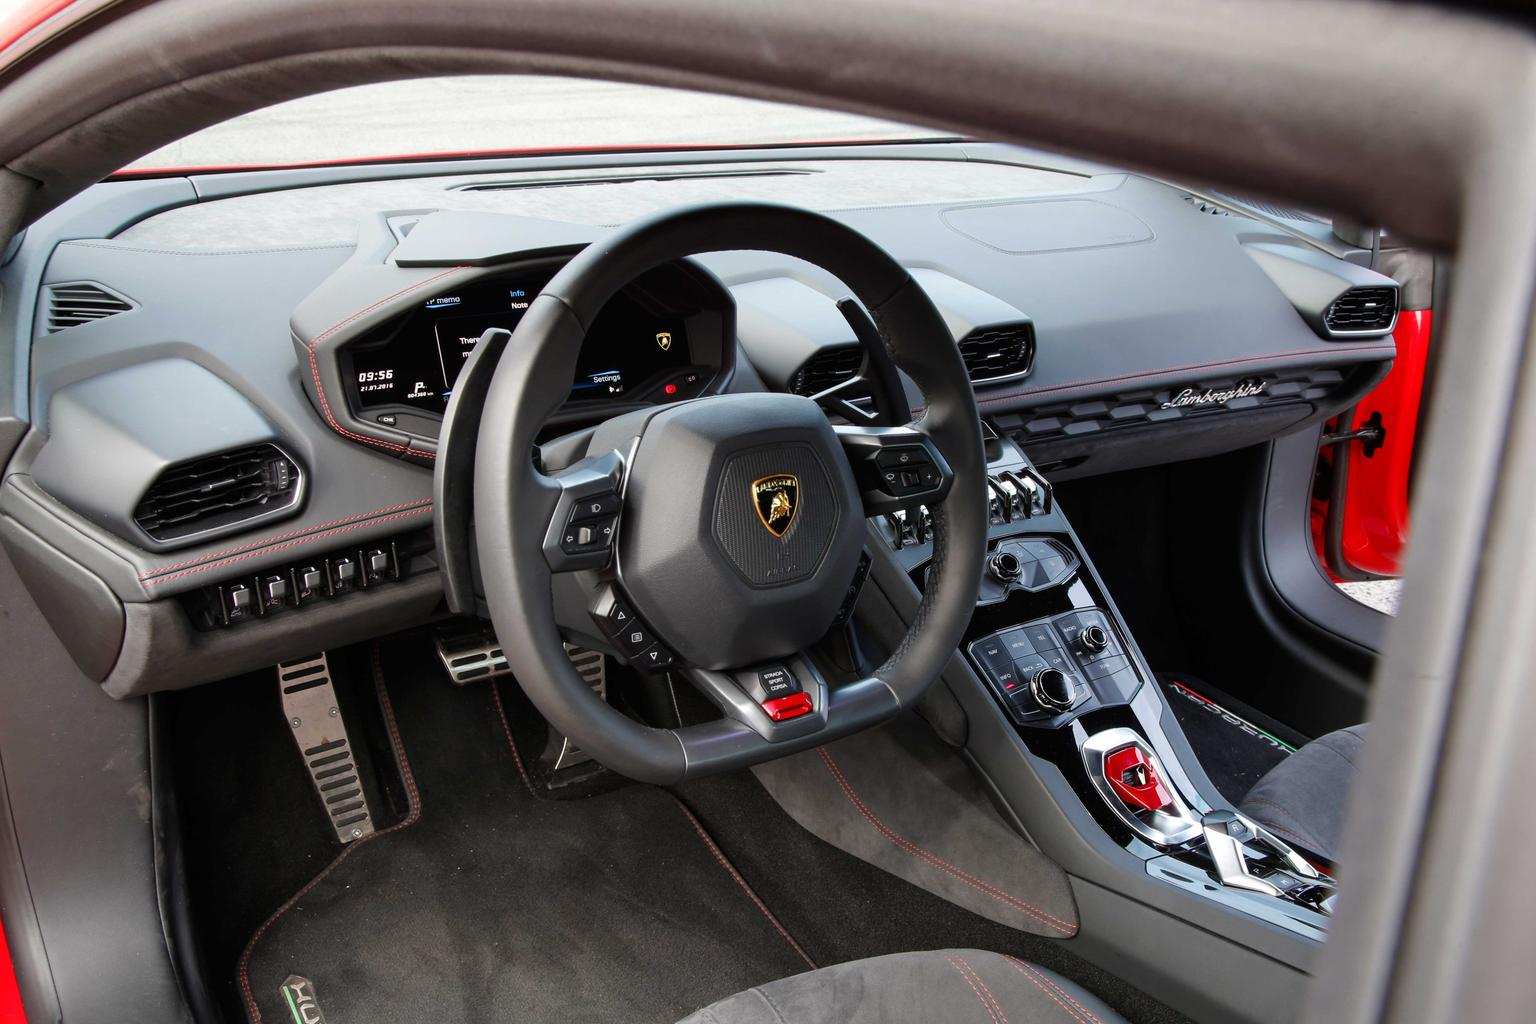 2016 Lamborghini Huracán LP580-2 review